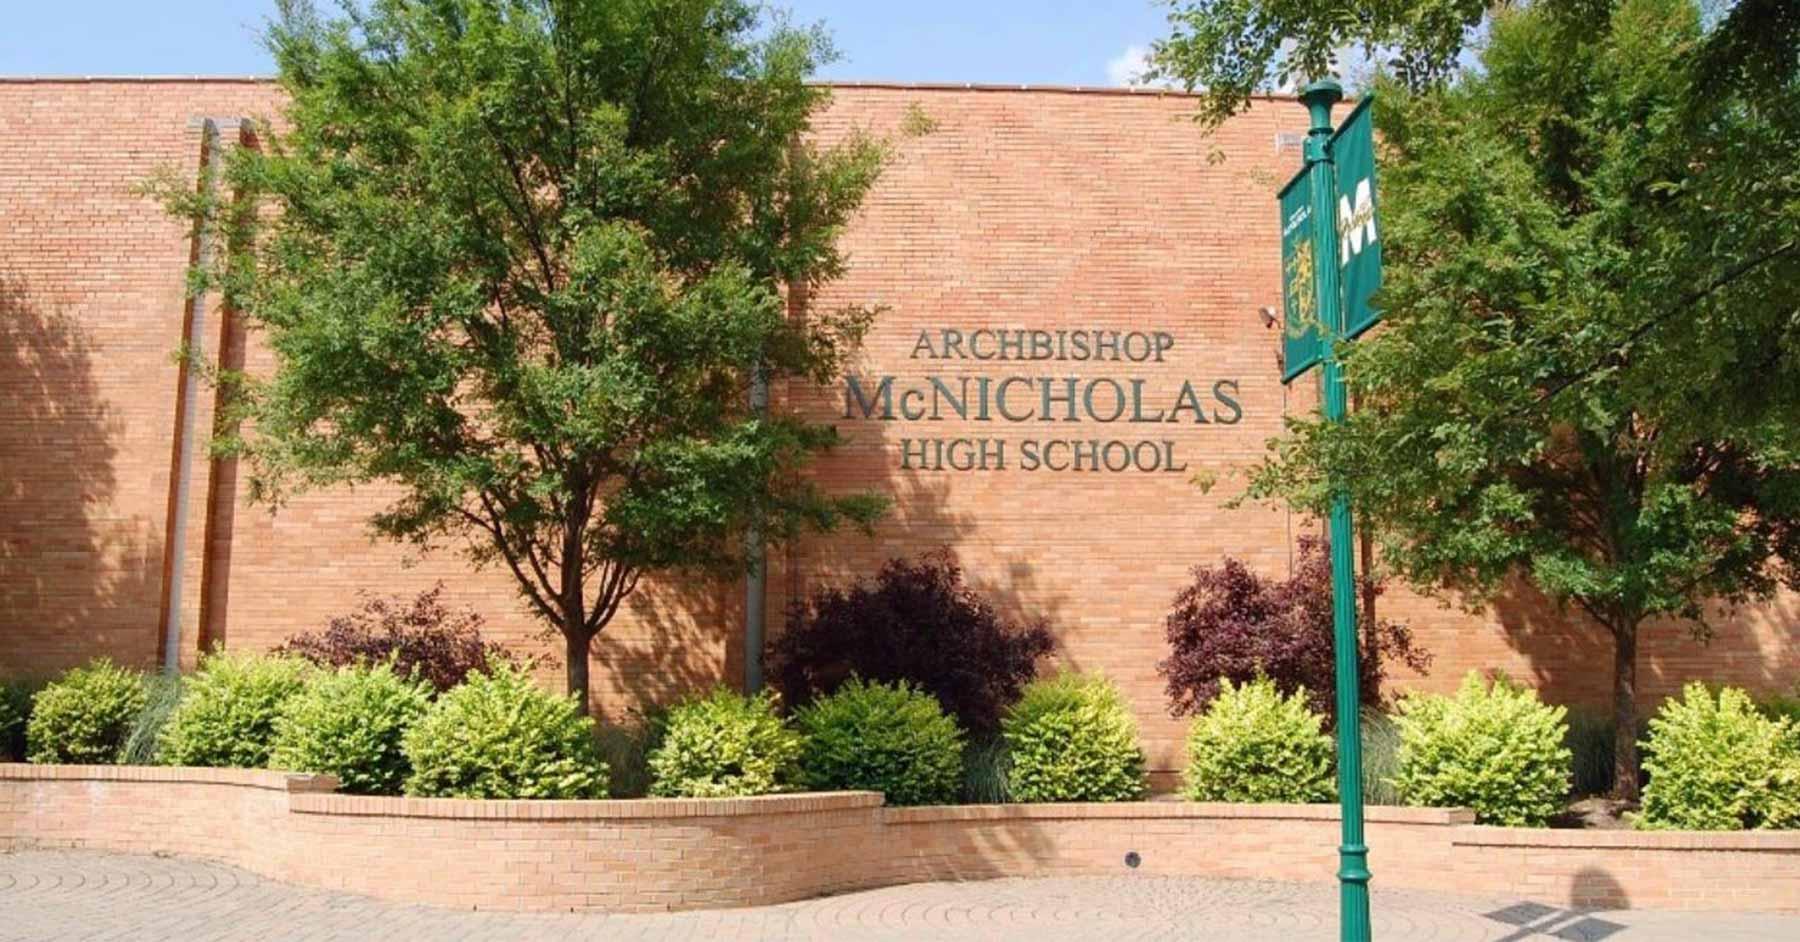 Ohio - Trường Trung học Archbishop McNicholas High School - USA